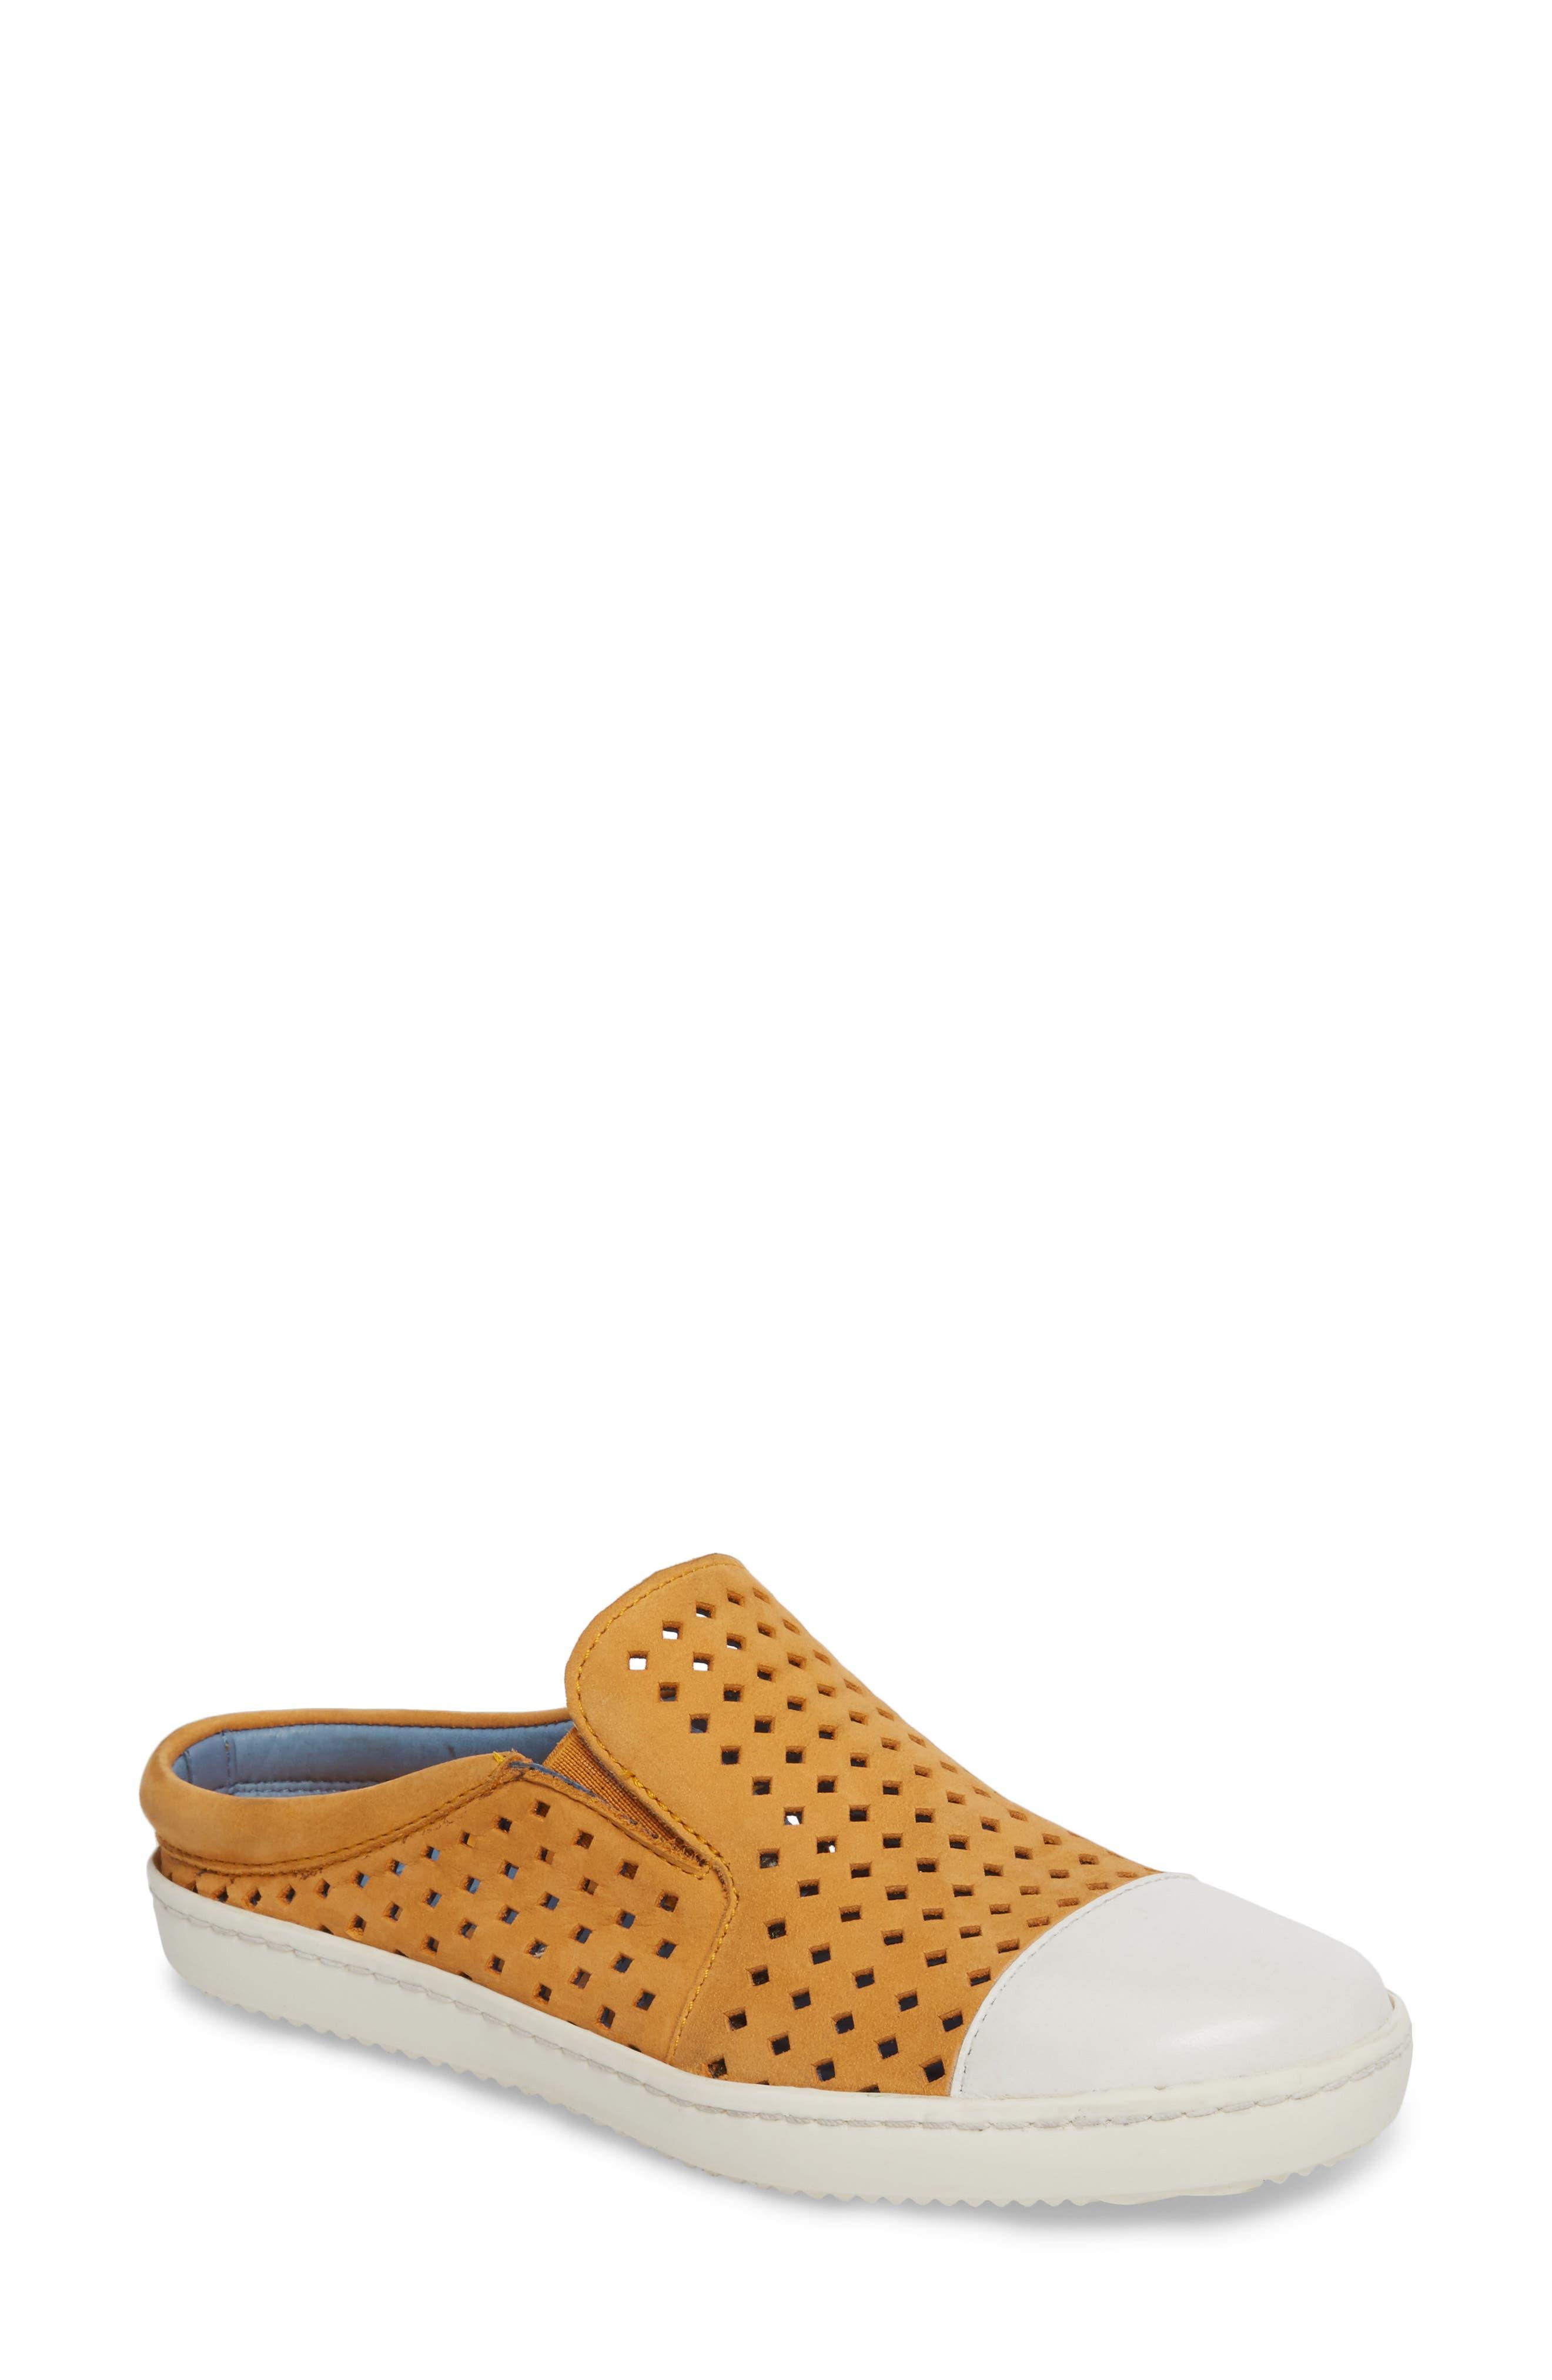 Tippy Slip-On Sneaker,                             Main thumbnail 1, color,                             Saffon Suede